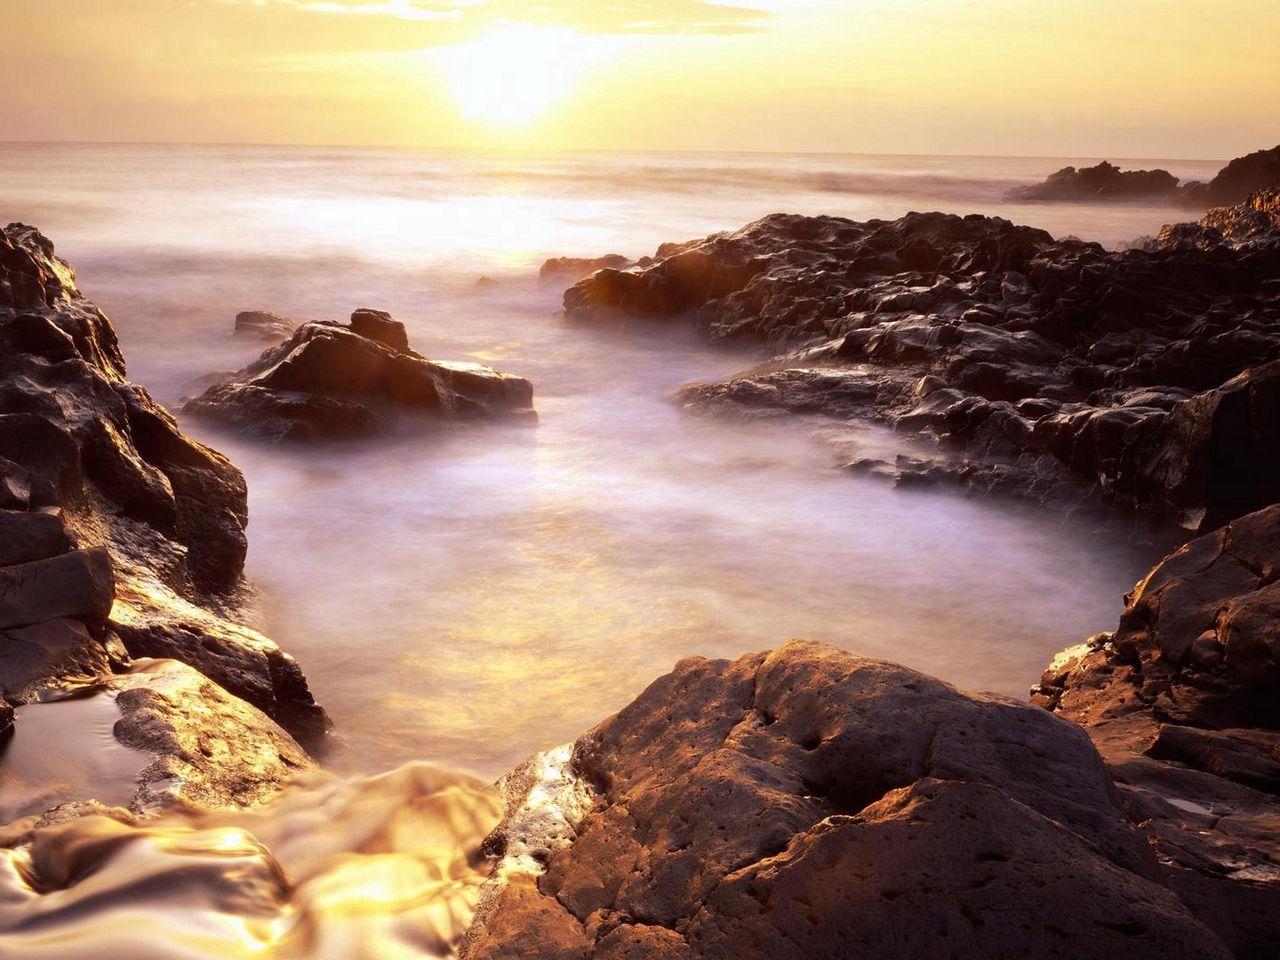 Download wallpaper 1280x960 evaporation stony coast rising sun 1280x960